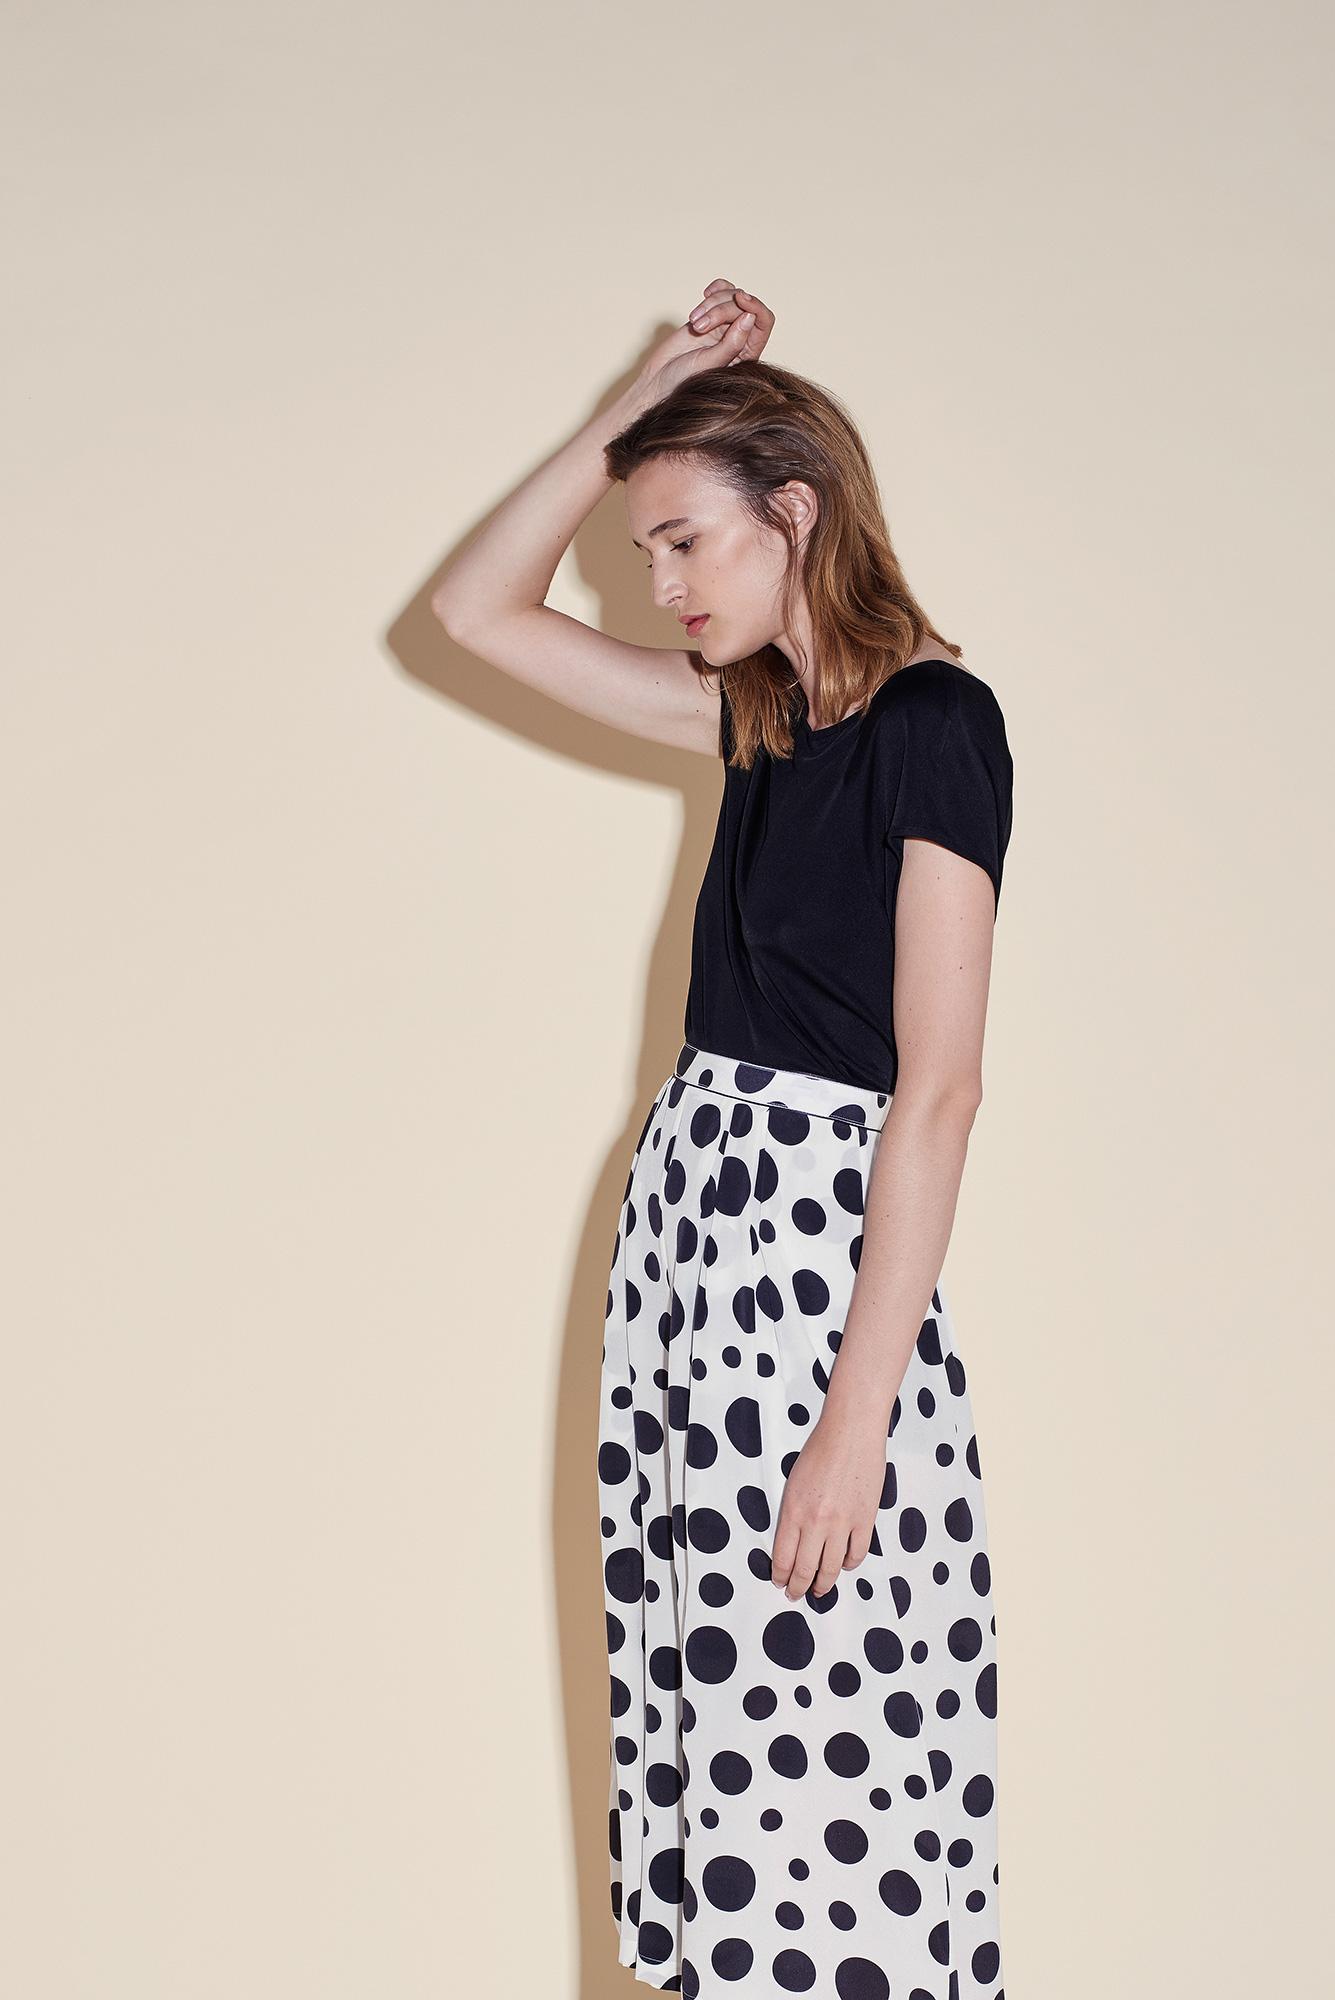 Culottes crepe silk polka dots black – short sleeves top silk jersey black